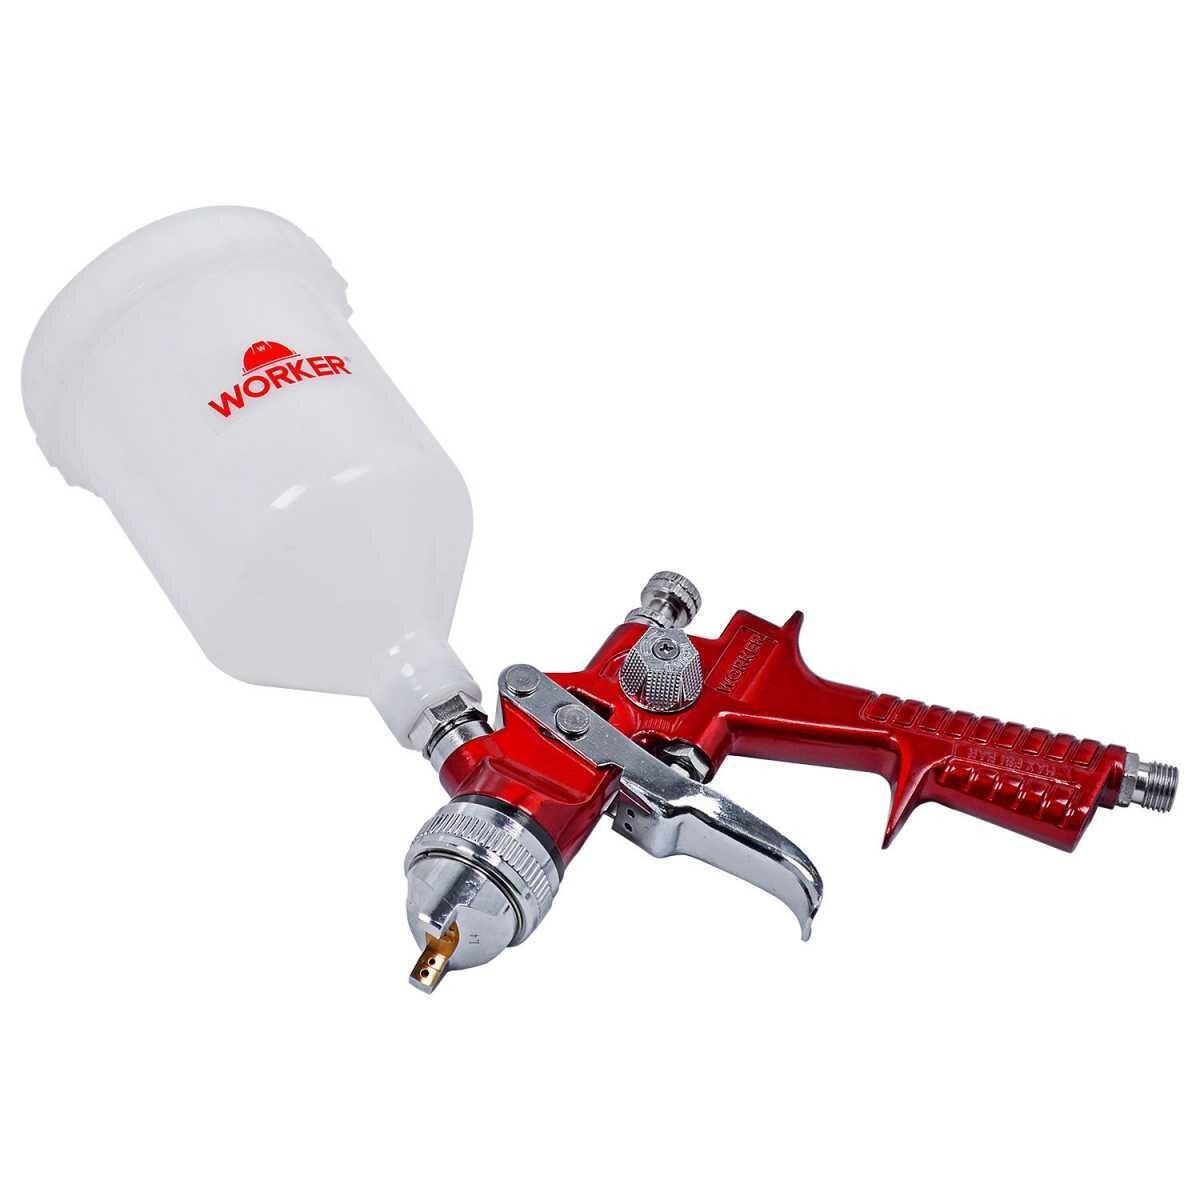 Pistola de Pintura Gravidade Hvlp Worker